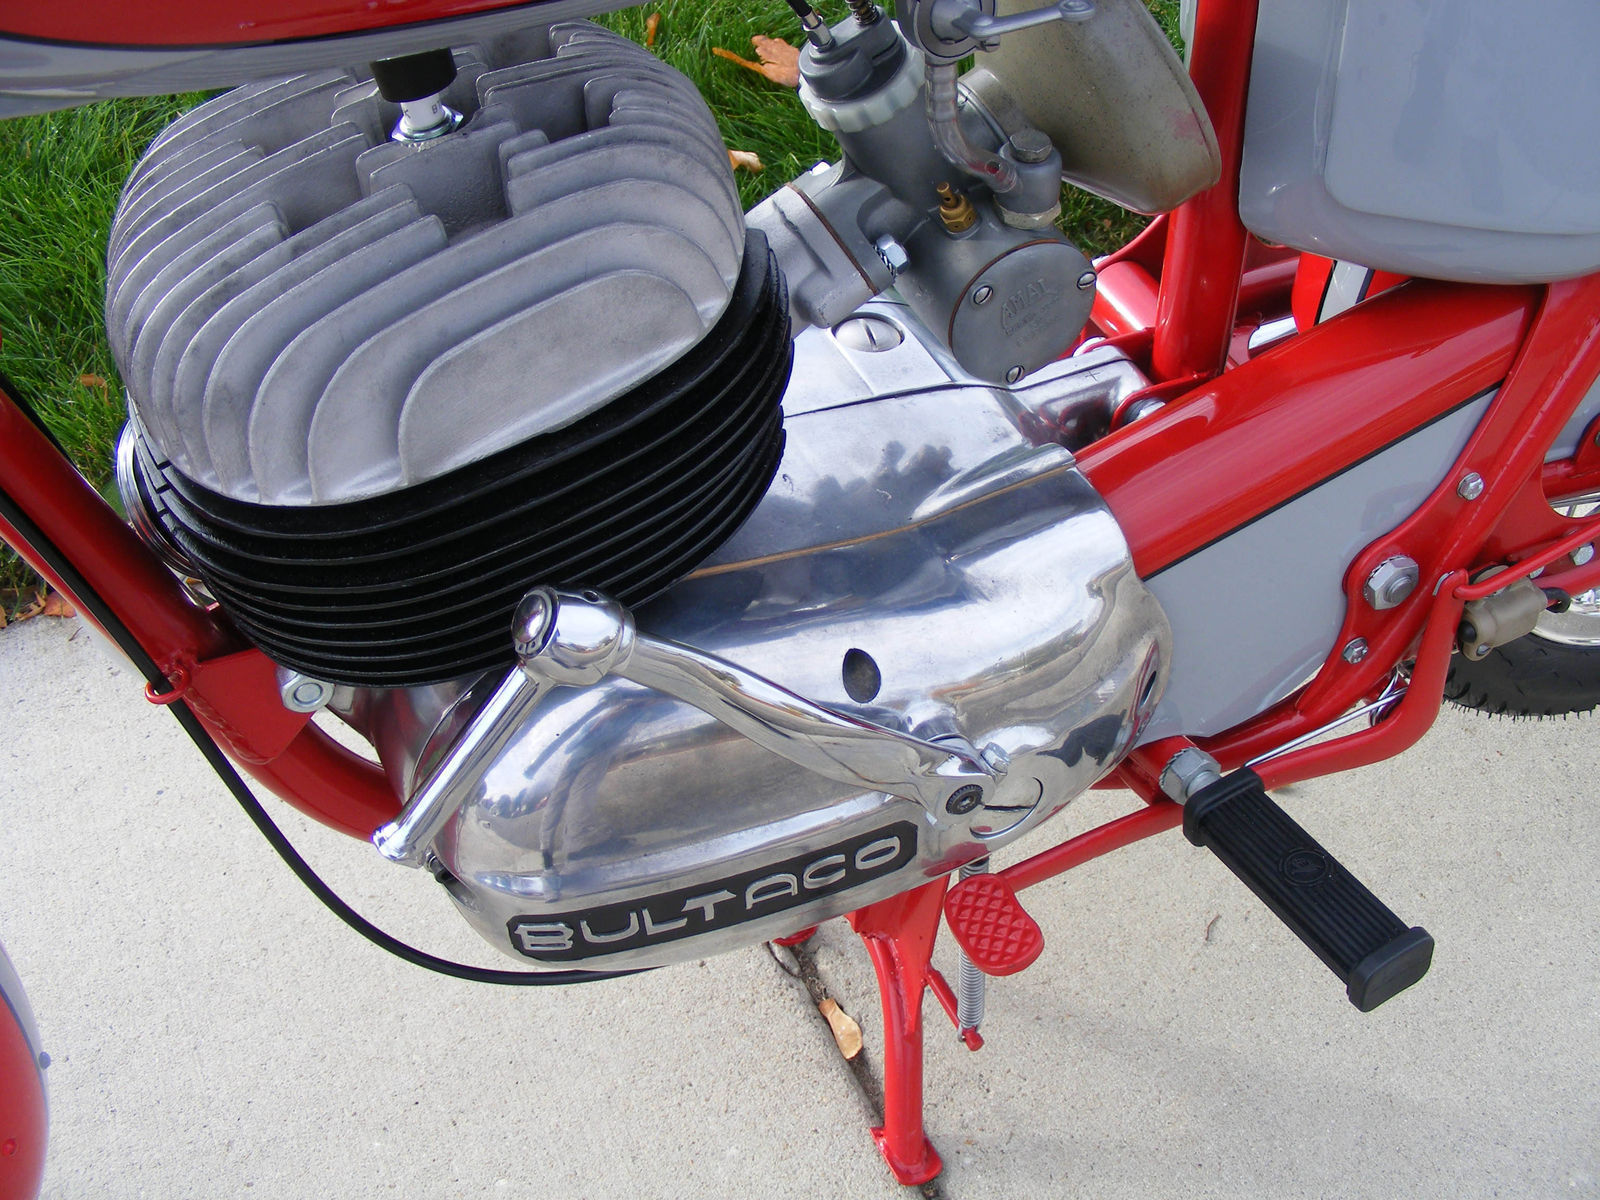 1966 Bultaco Mercurio   1966 Bultaco Mercurio 200 restoration